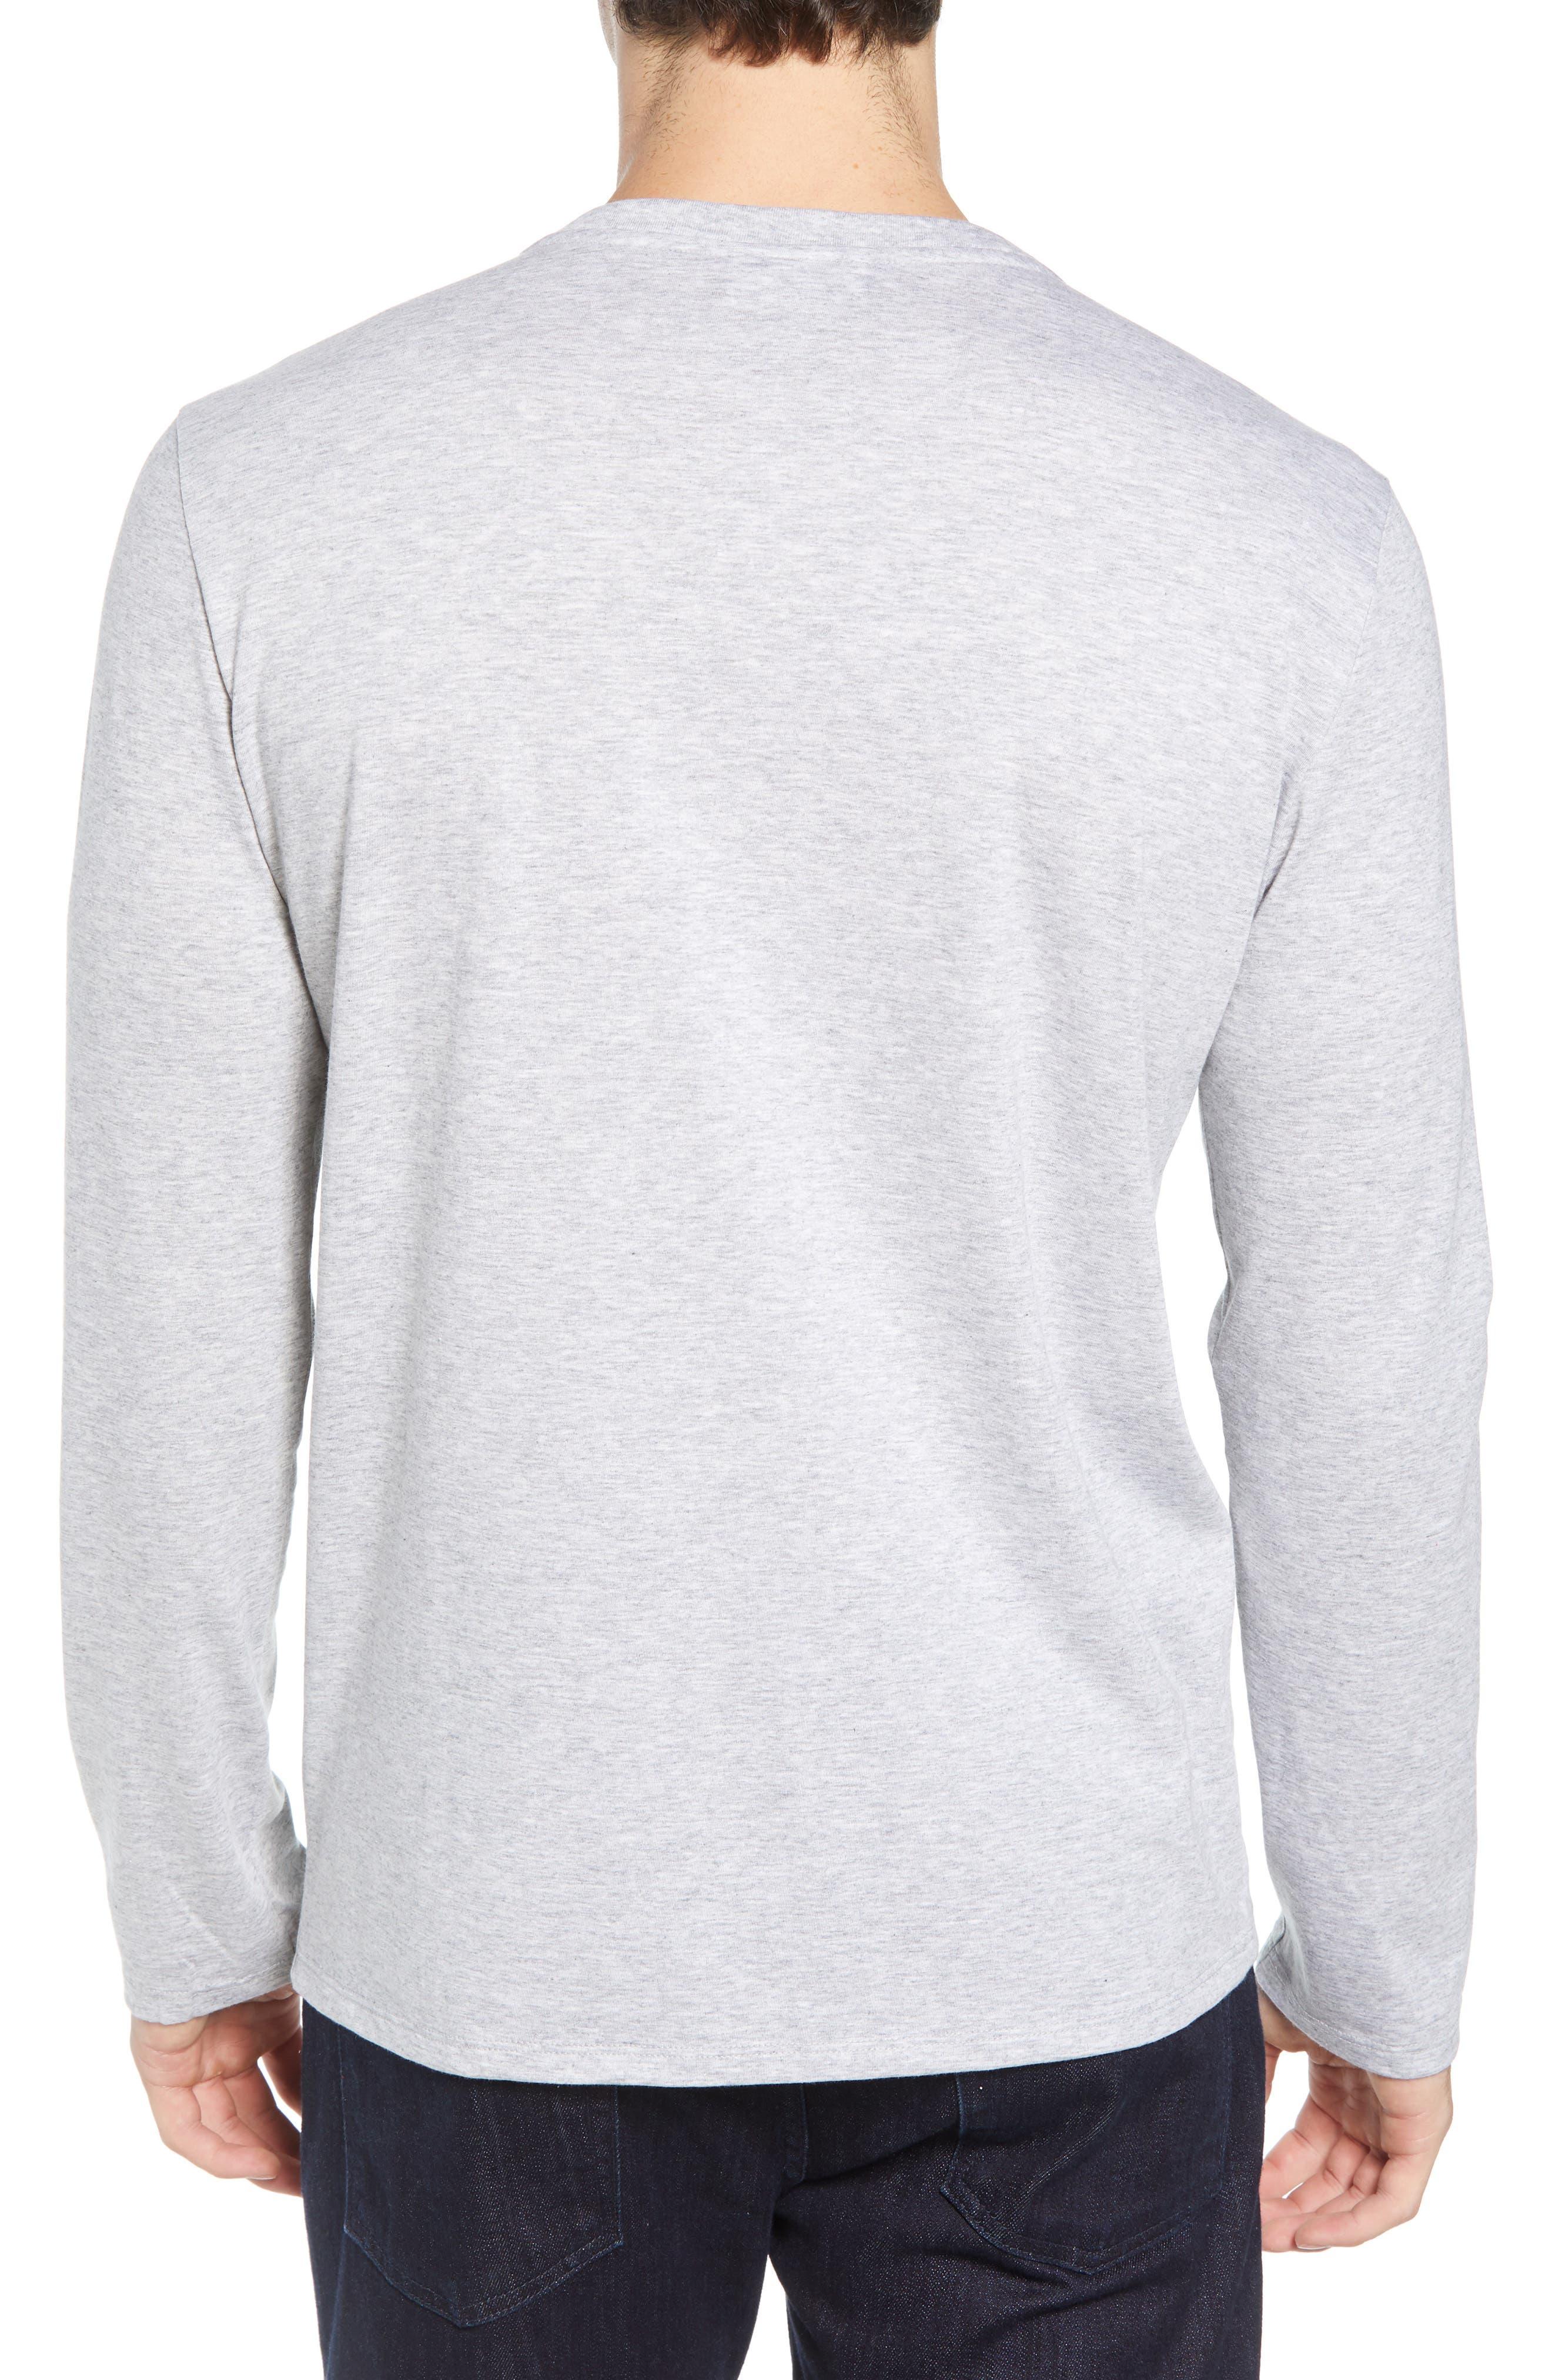 Long Sleeve T-Shirt,                             Alternate thumbnail 2, color,                             SILVER CHINE